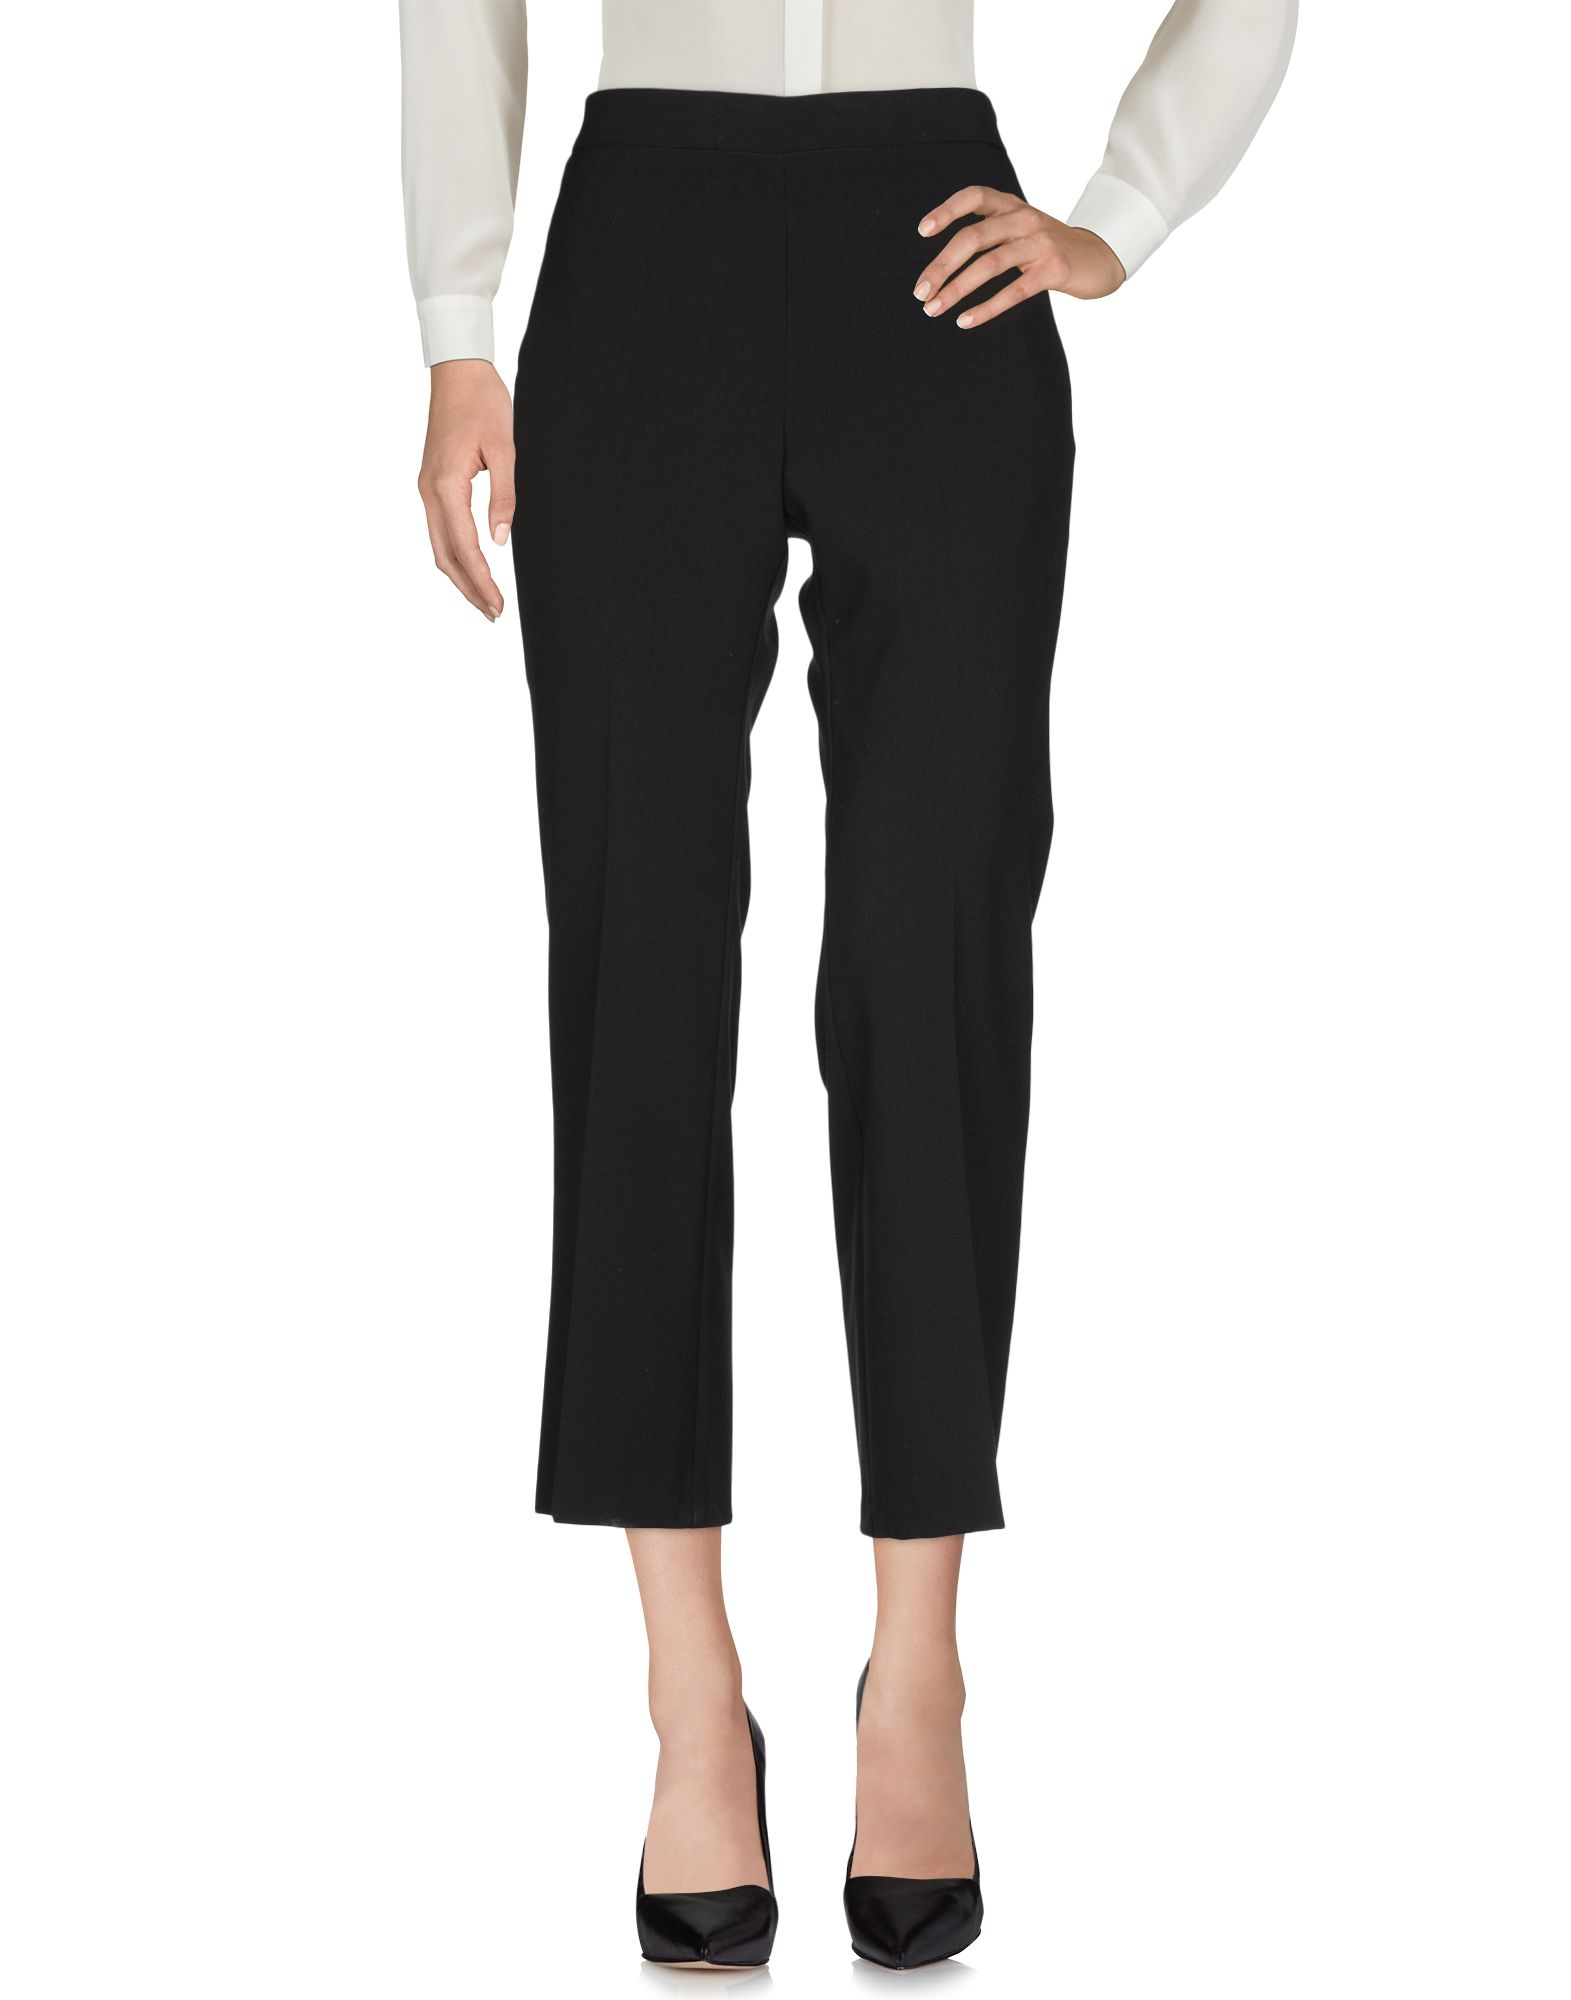 Pantalone Kaos donna donna - 13219311LR